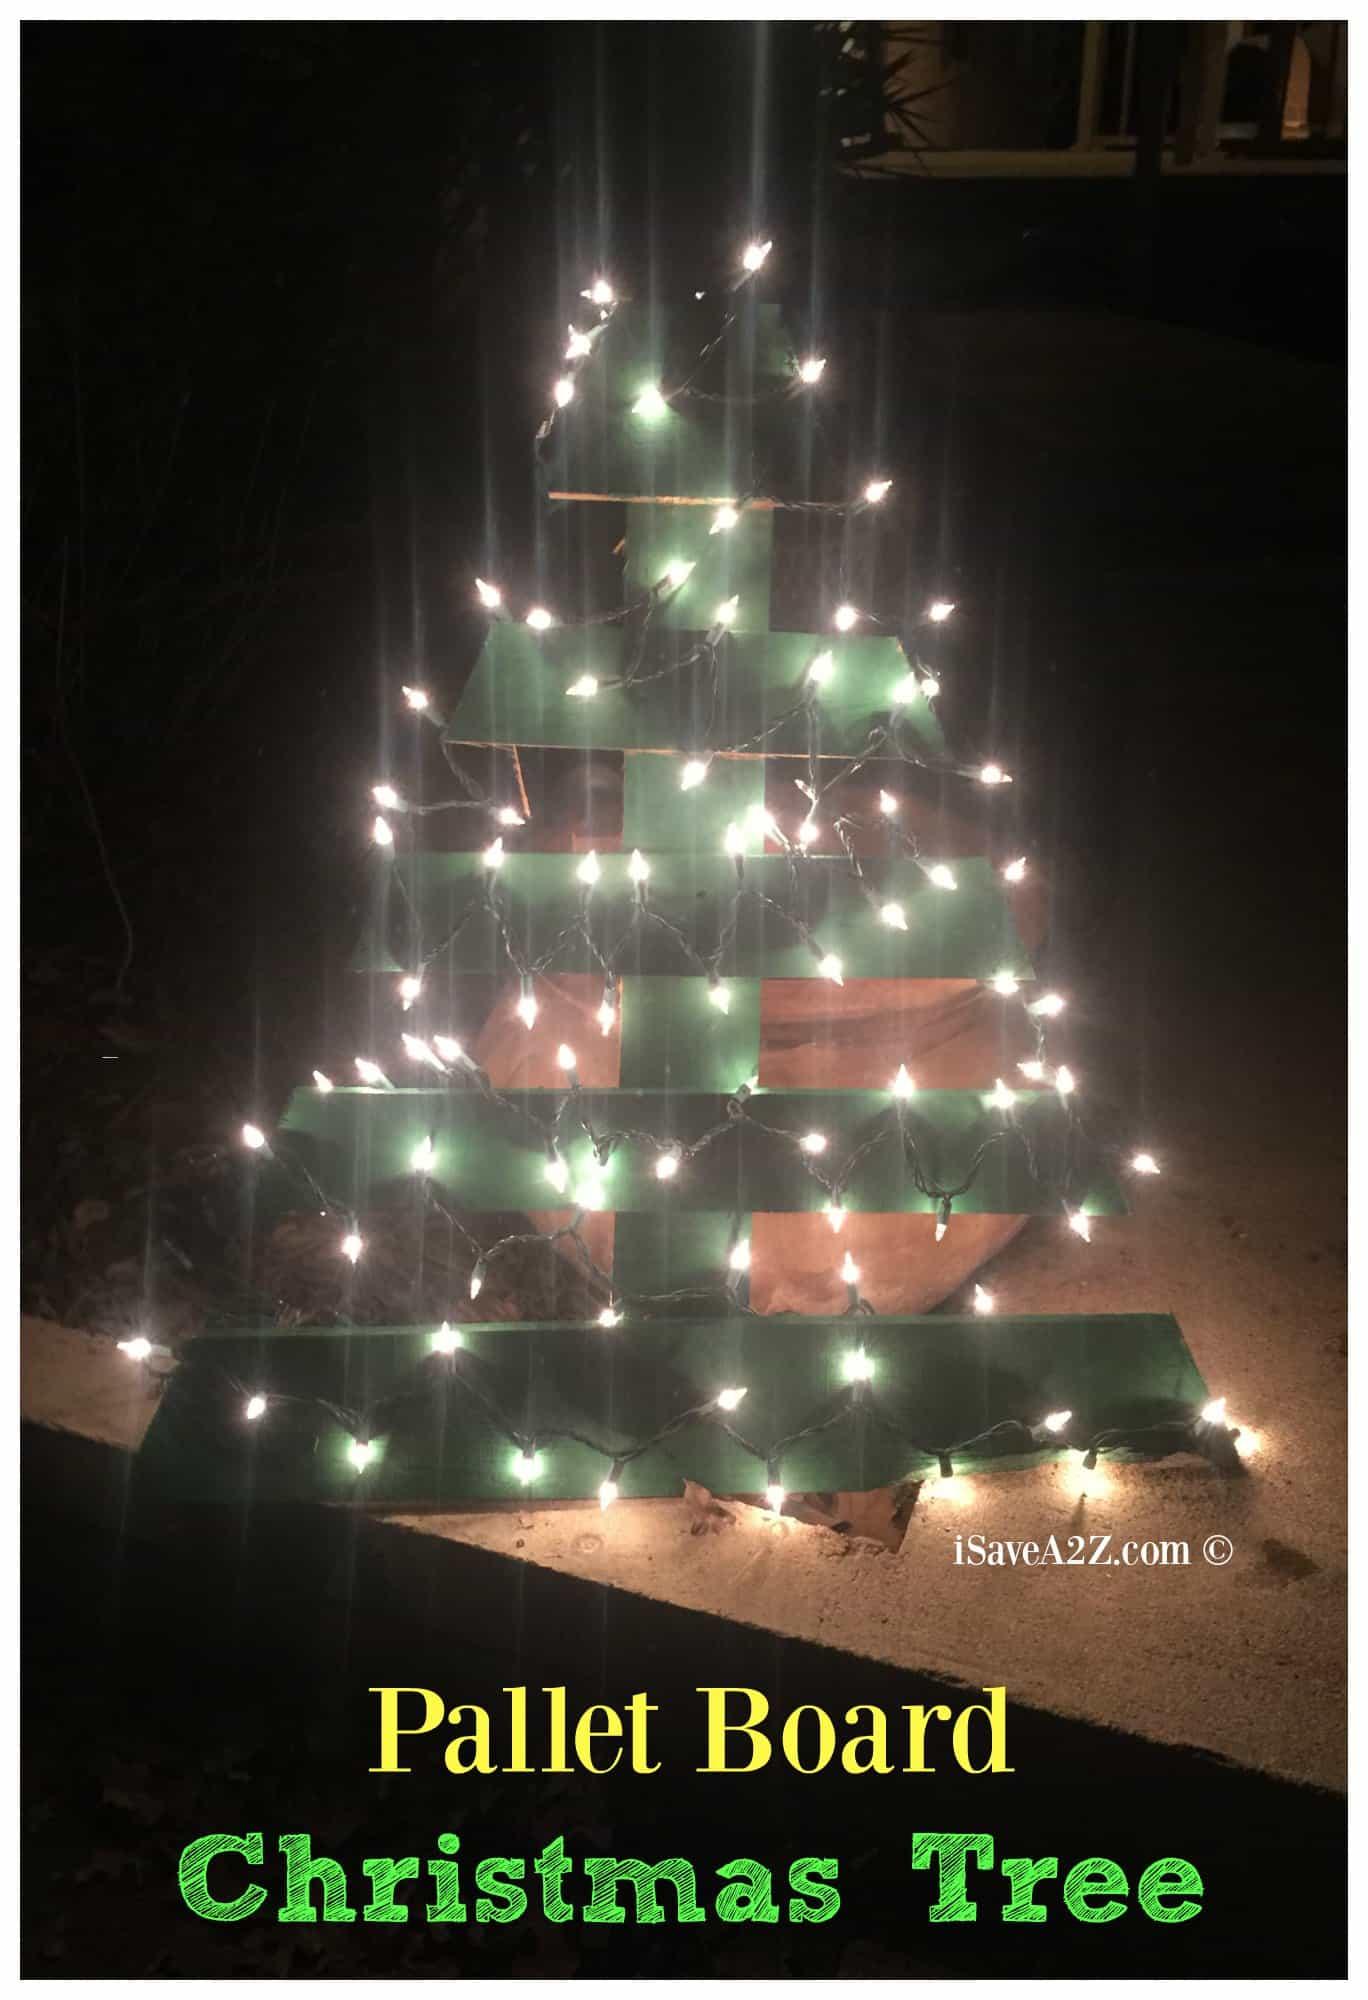 Pallet Board Christmas Tree Idea